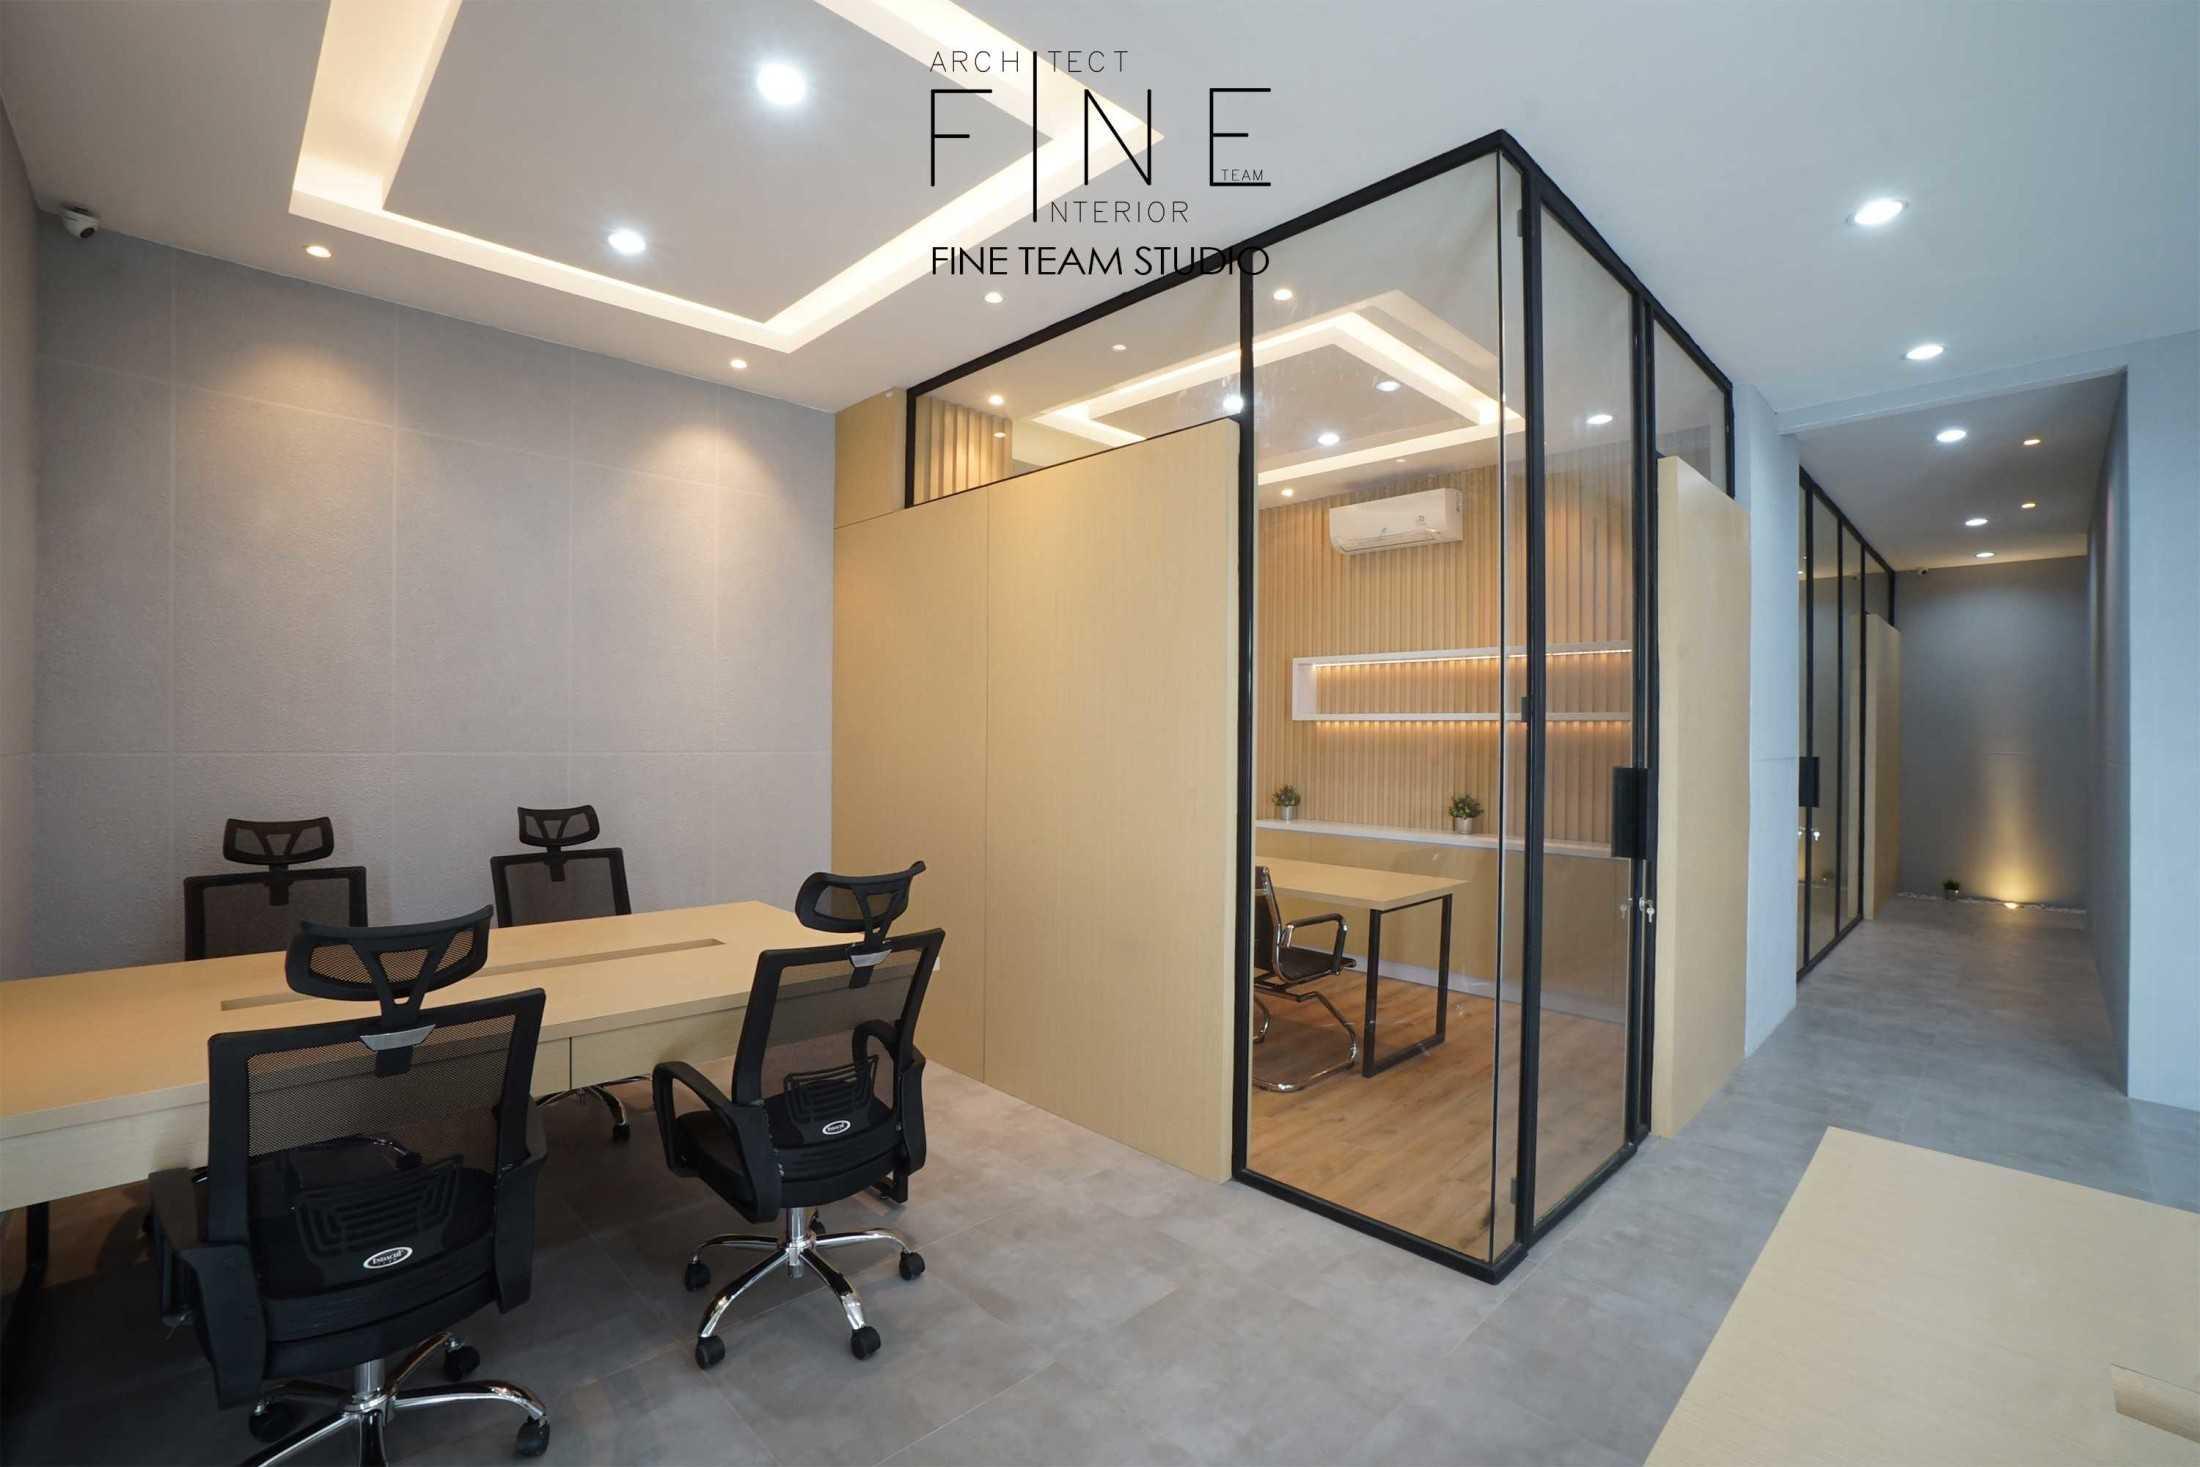 Fine Team Studio Mob Office Cikupa, Tangerang, Banten, Indonesia Cikupa, Tangerang, Banten, Indonesia Fine-Team-Studio-Mob-Office  71119